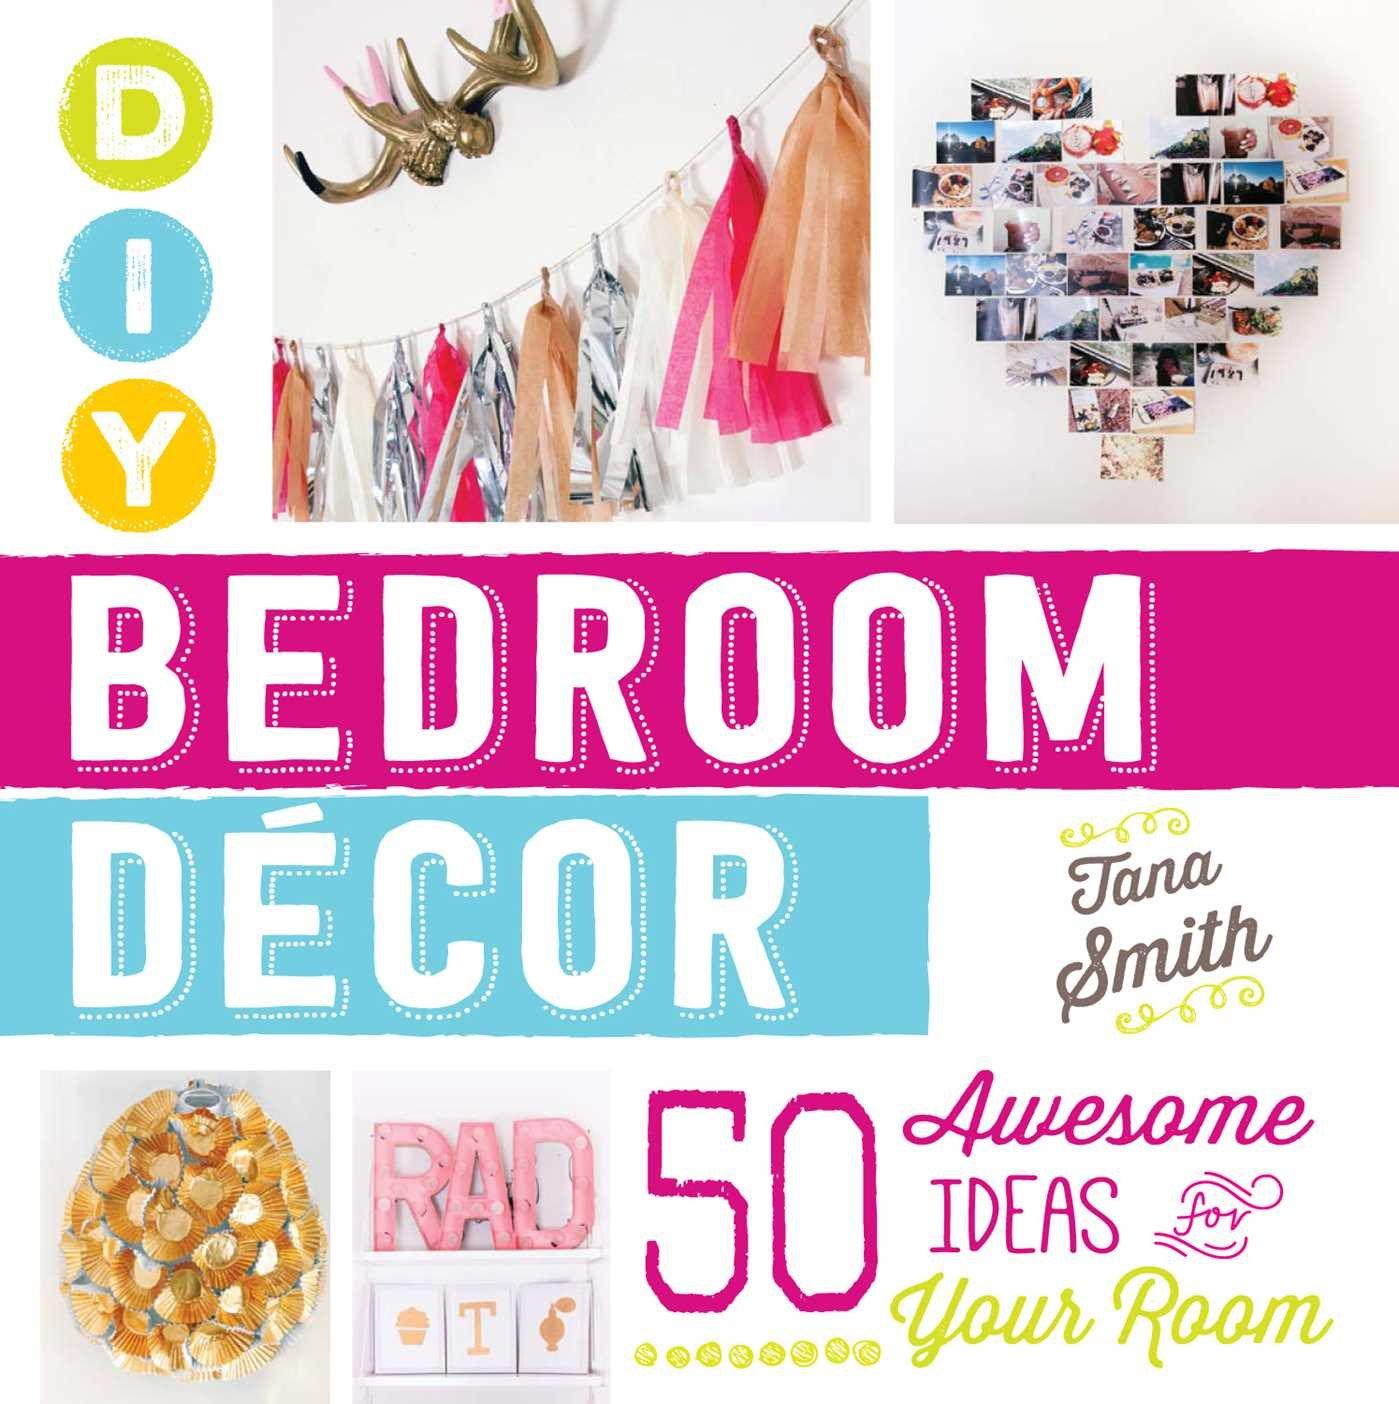 Amazon Com Diy Bedroom Decor 50 Awesome Ideas For Your Room 0045079588028 Smith Tana Books